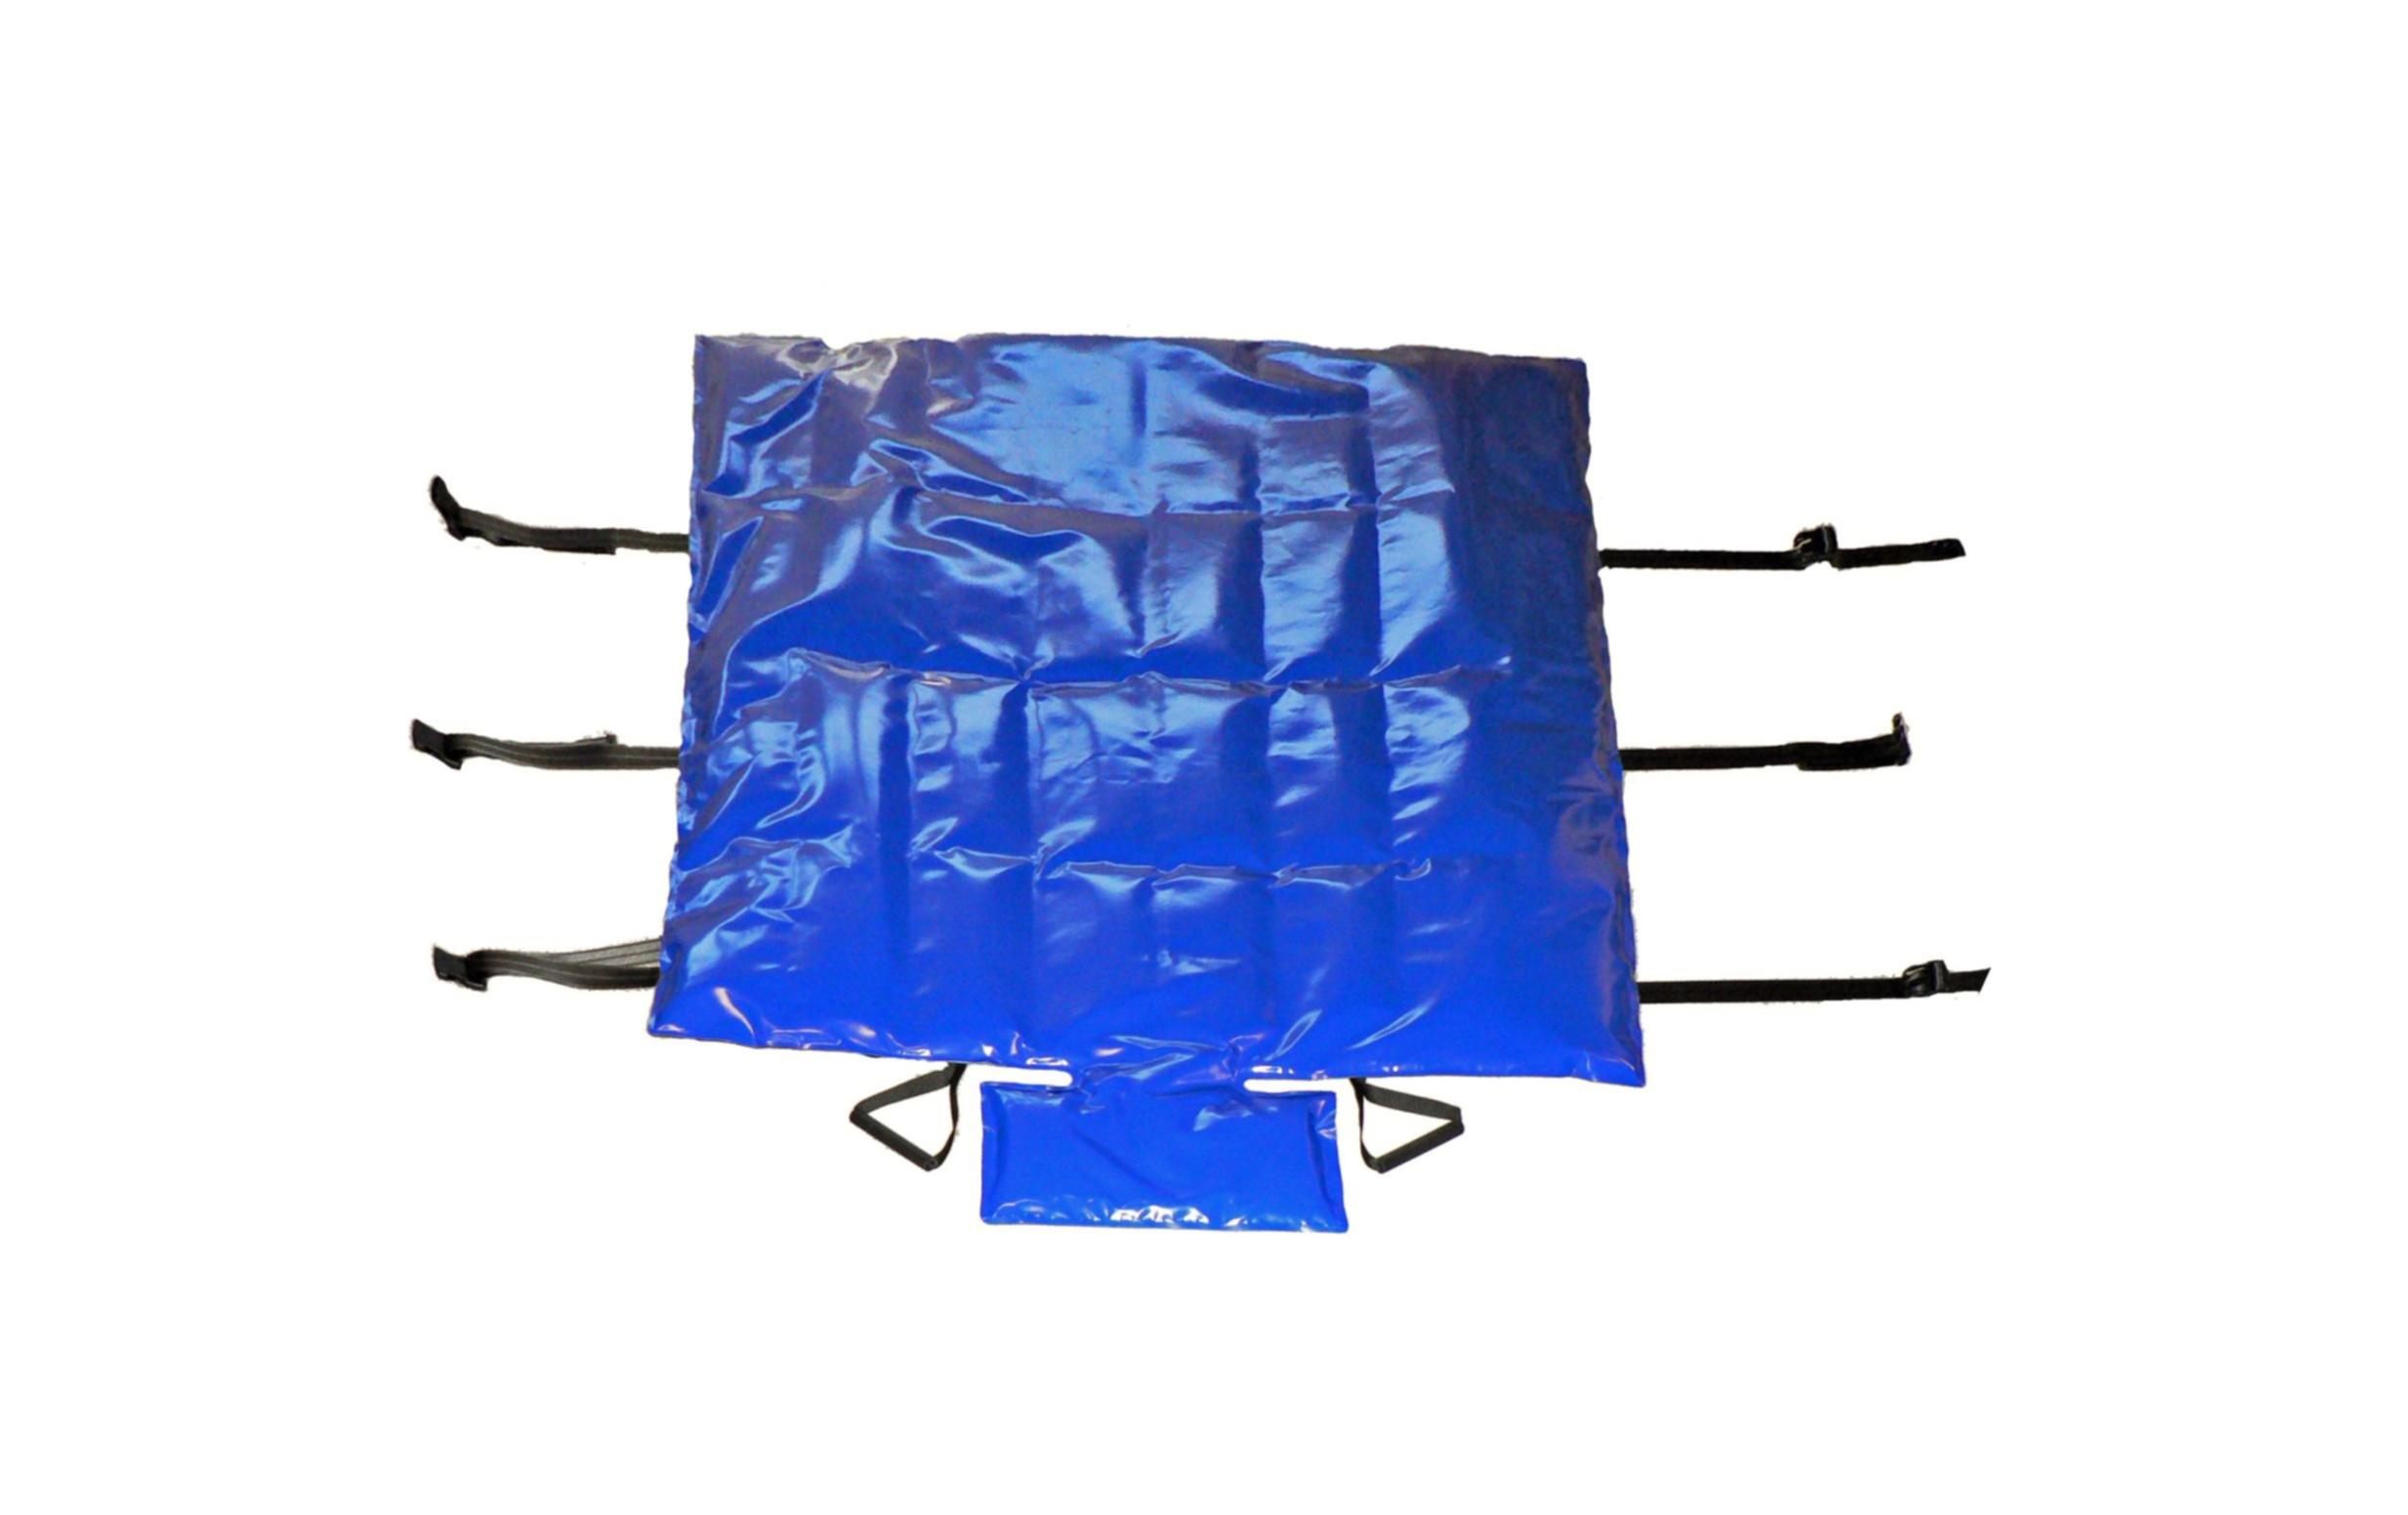 Adipositas-Vakuum-Matratze bis 350 kg